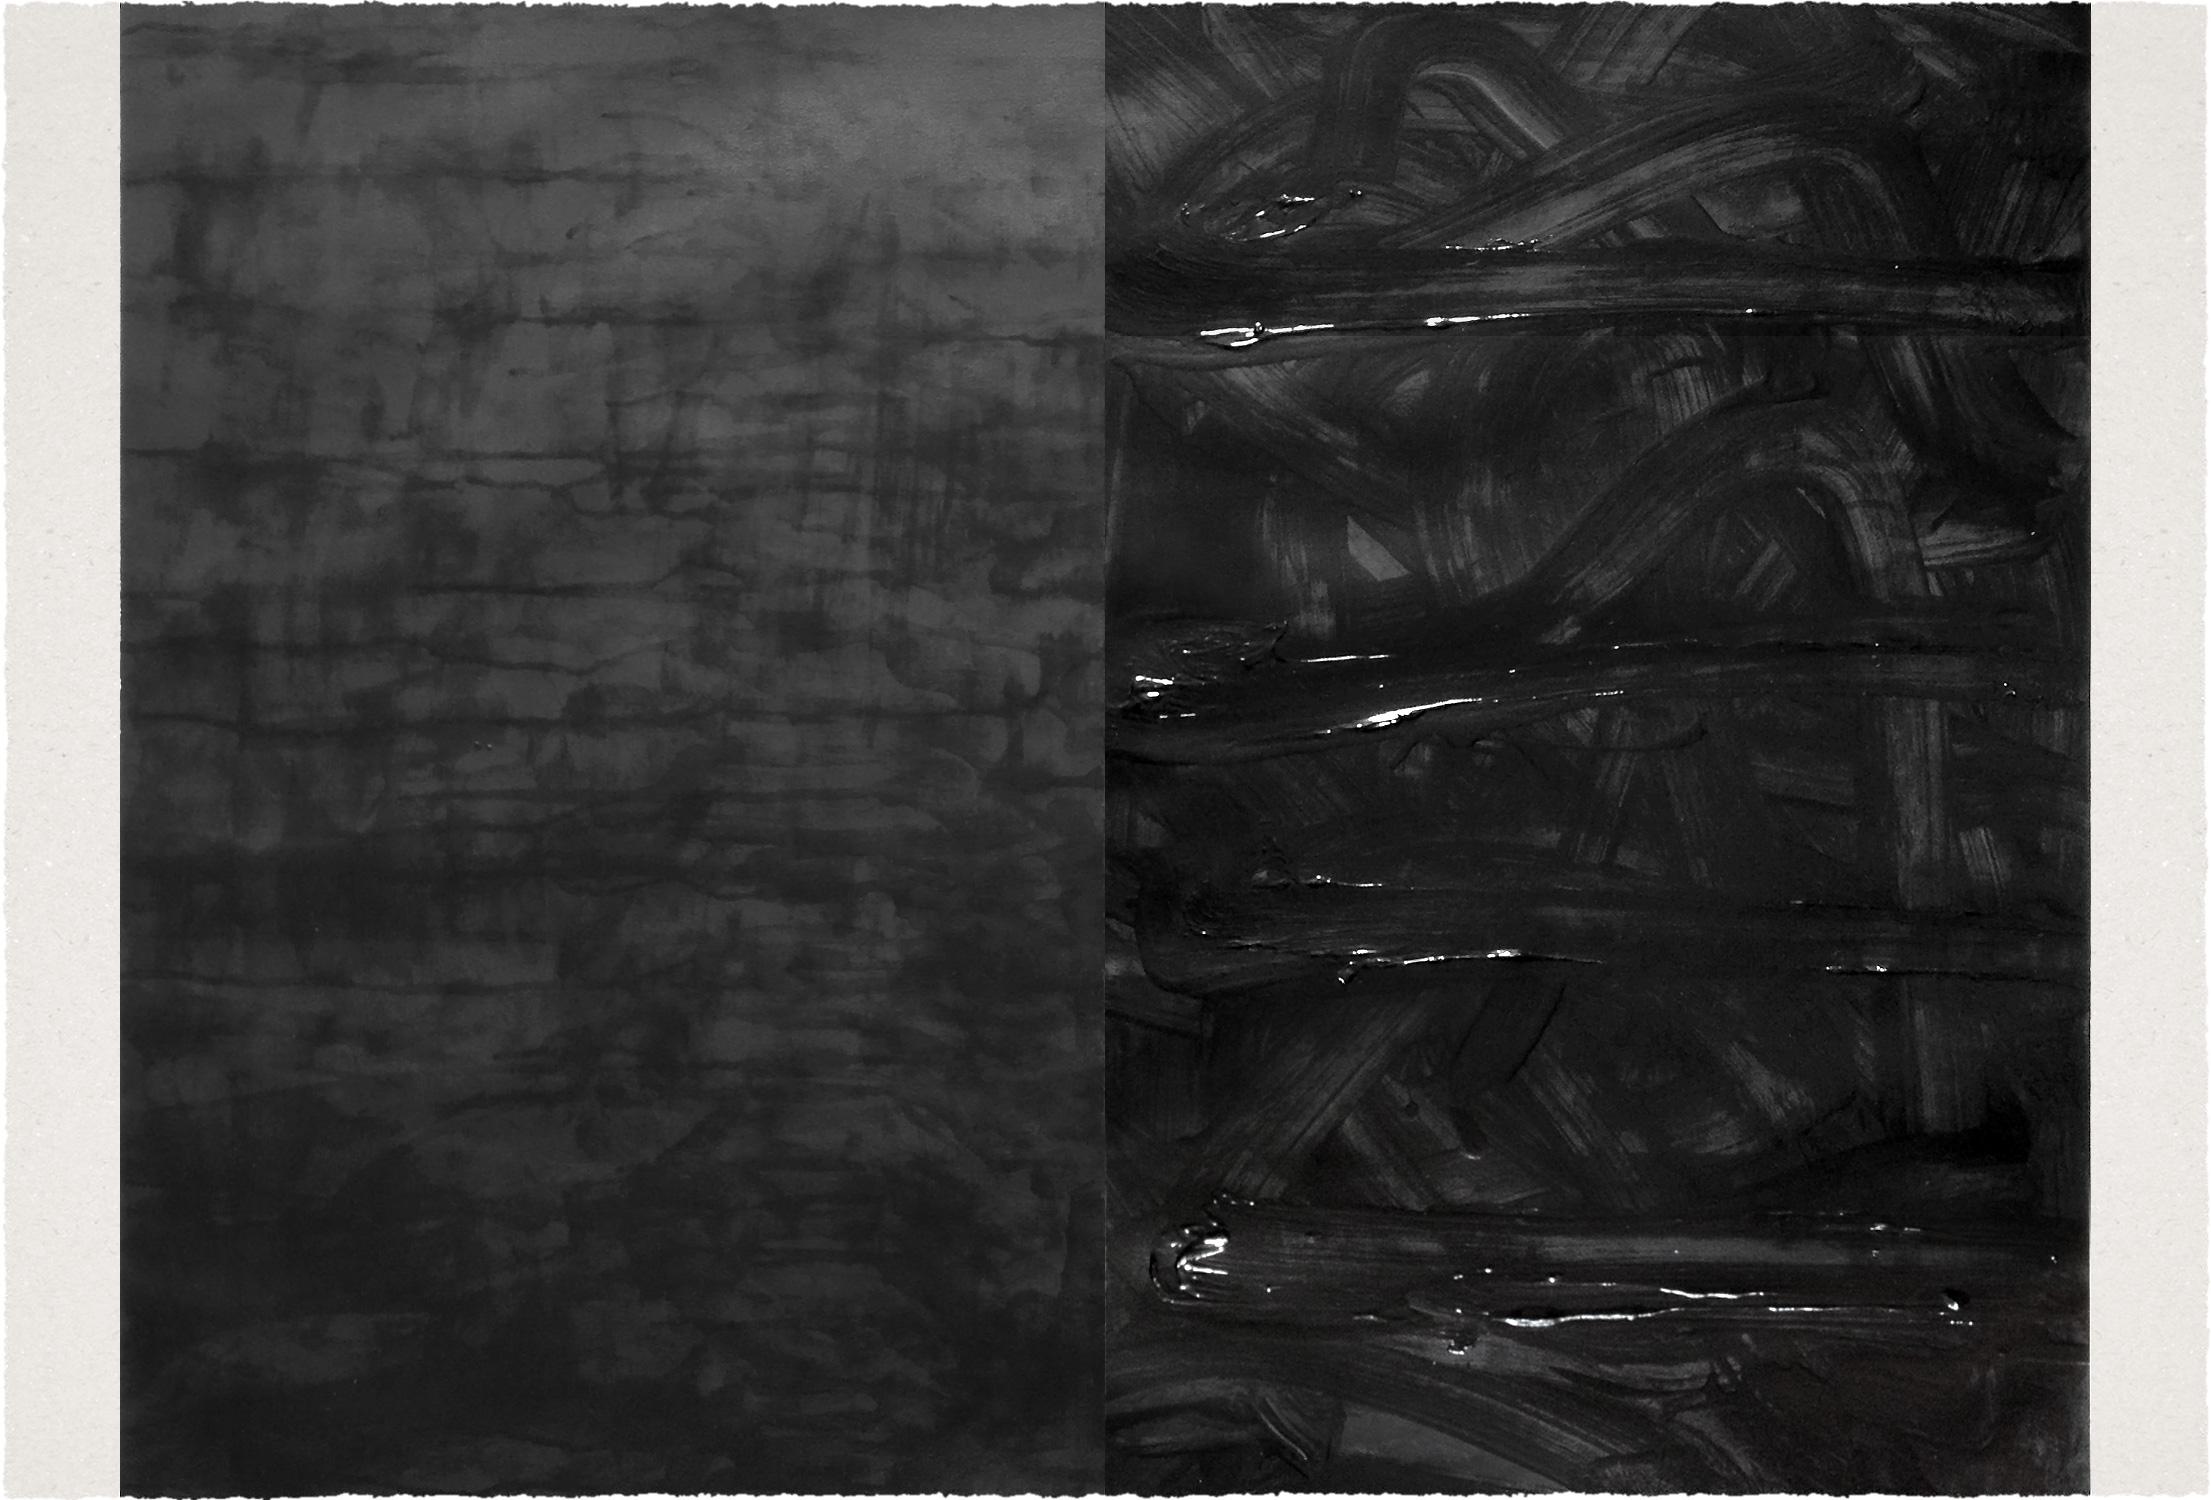 Líneas Negras — Diego Berjon